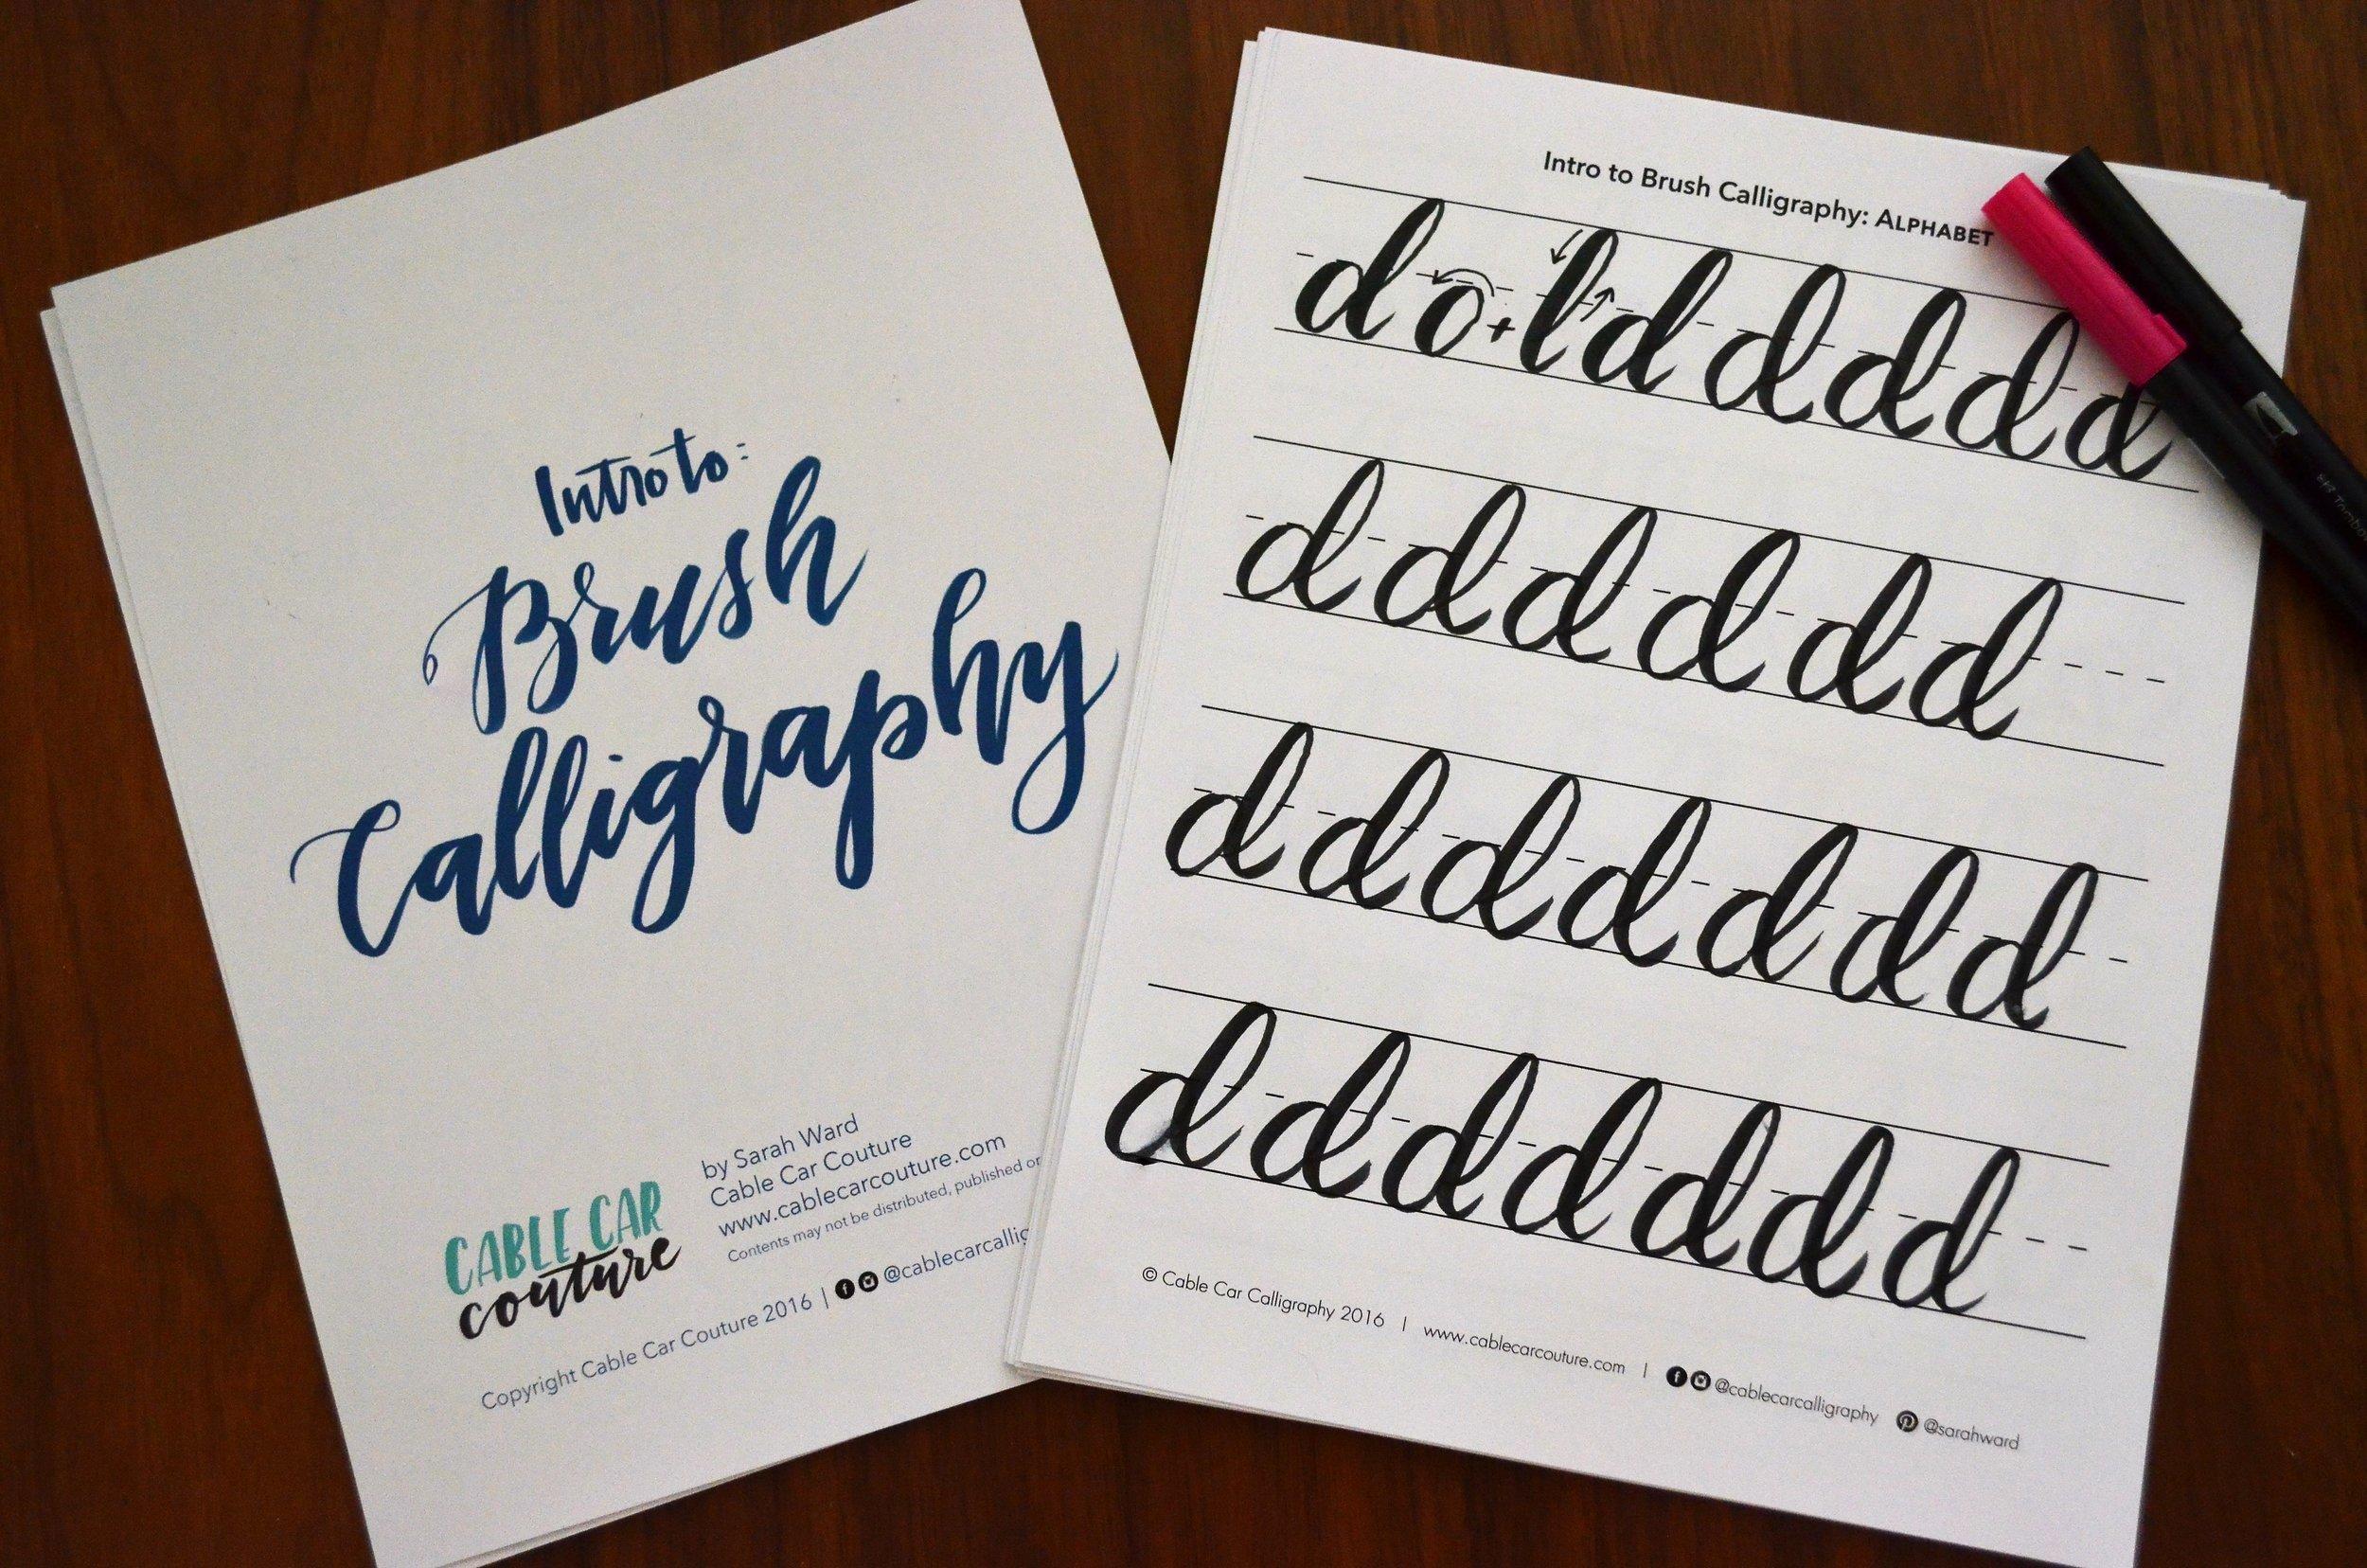 Modern Brush Calligraphy / warporweft.com